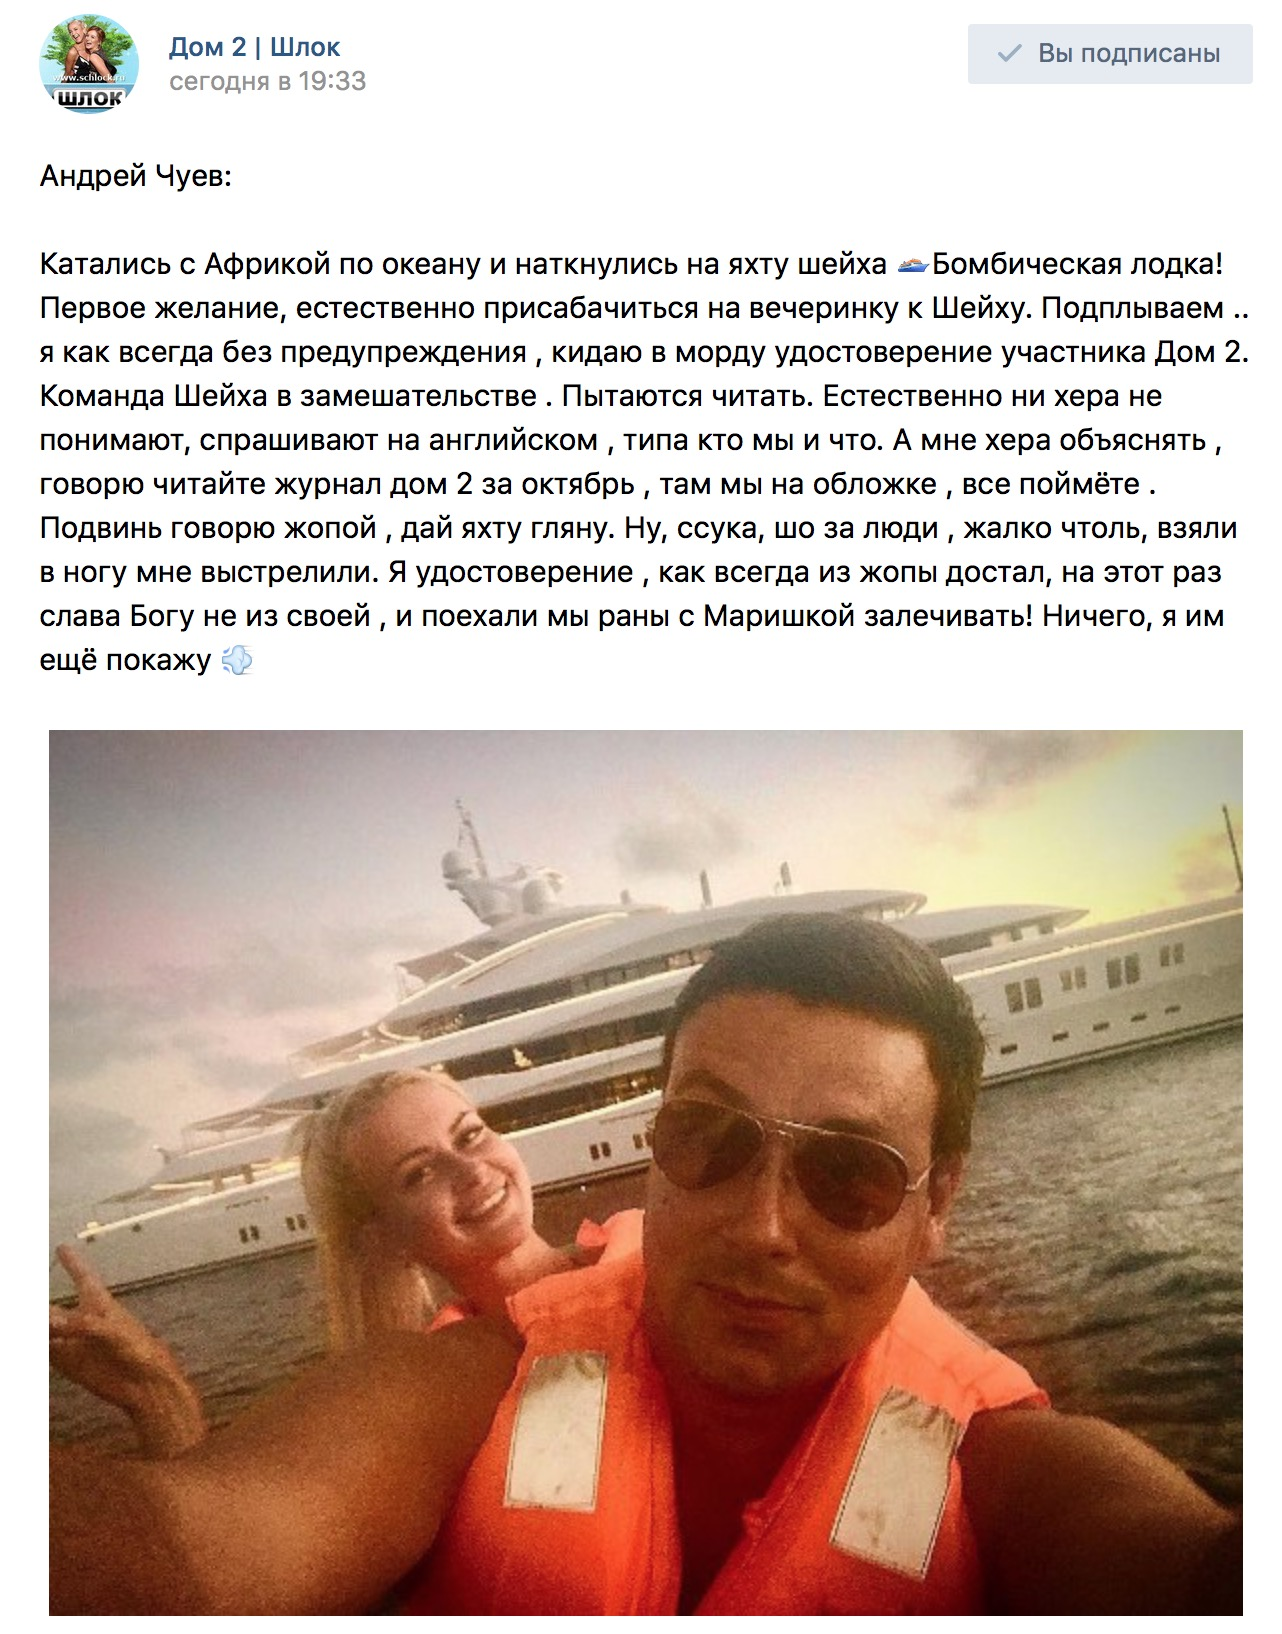 Андрею Чуеву стреляли в ногу